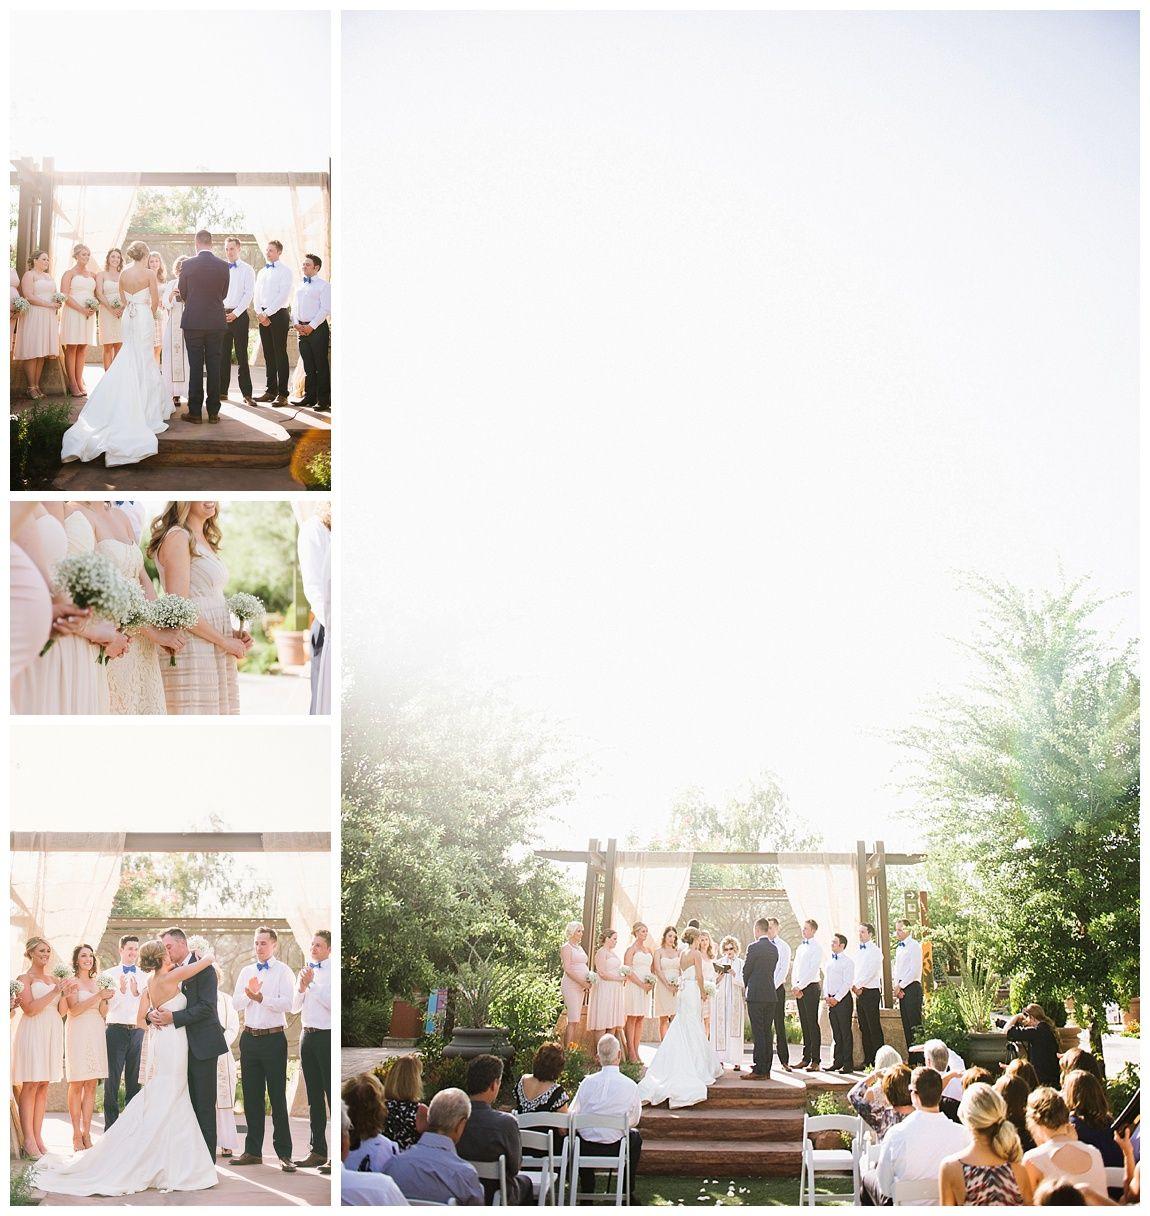 Las Vegas Wedding Planner Springs Preserve Arboretum Ceremony Mismatched Bridesmaid Dresses